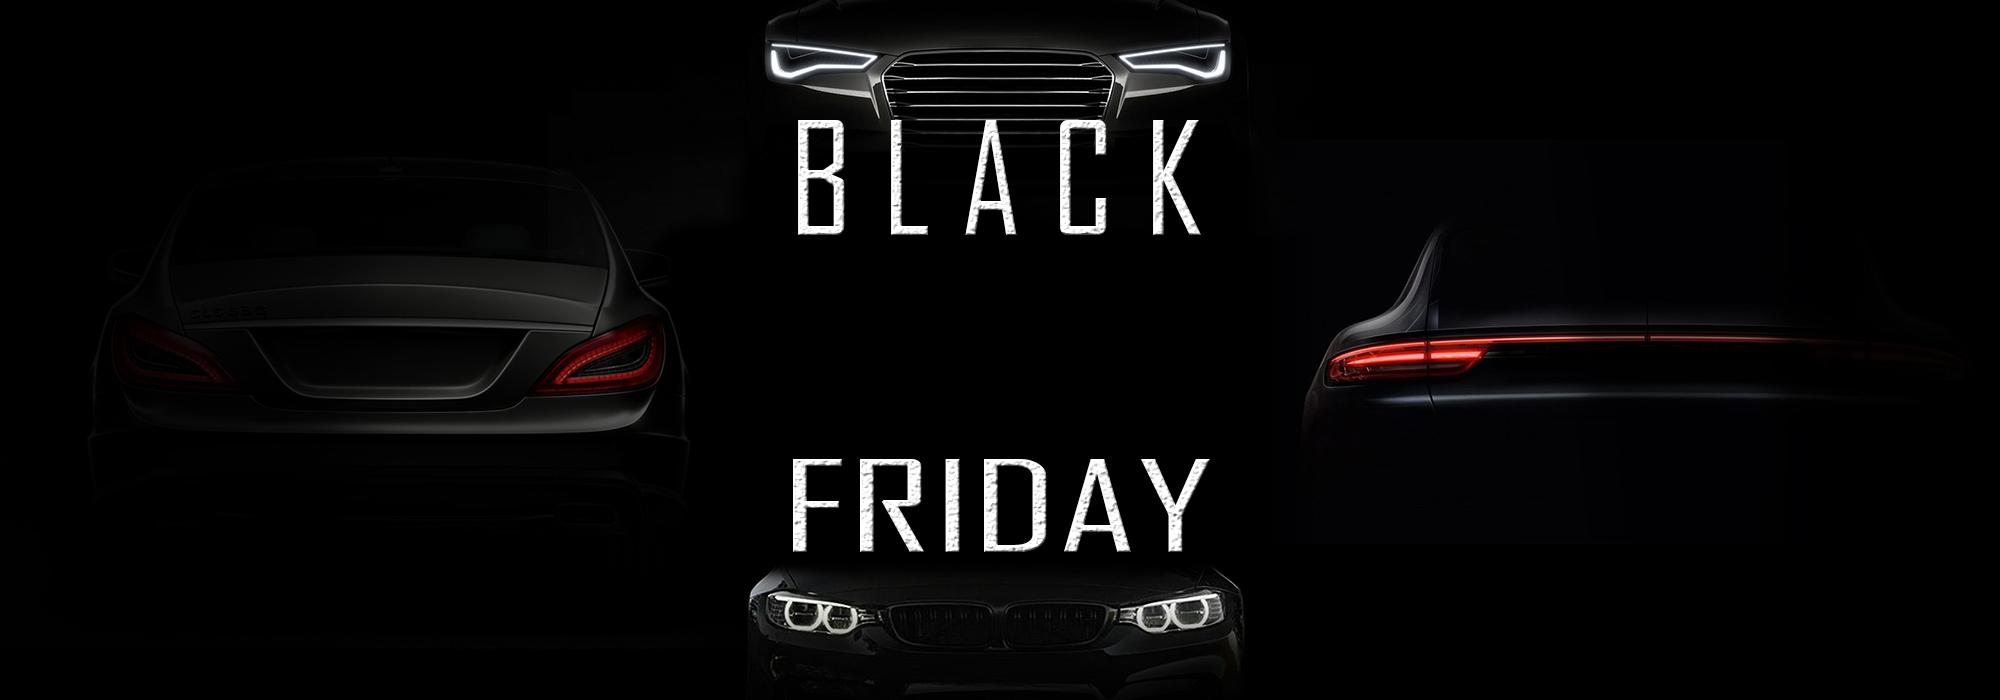 ModBargains Black Friday 2020